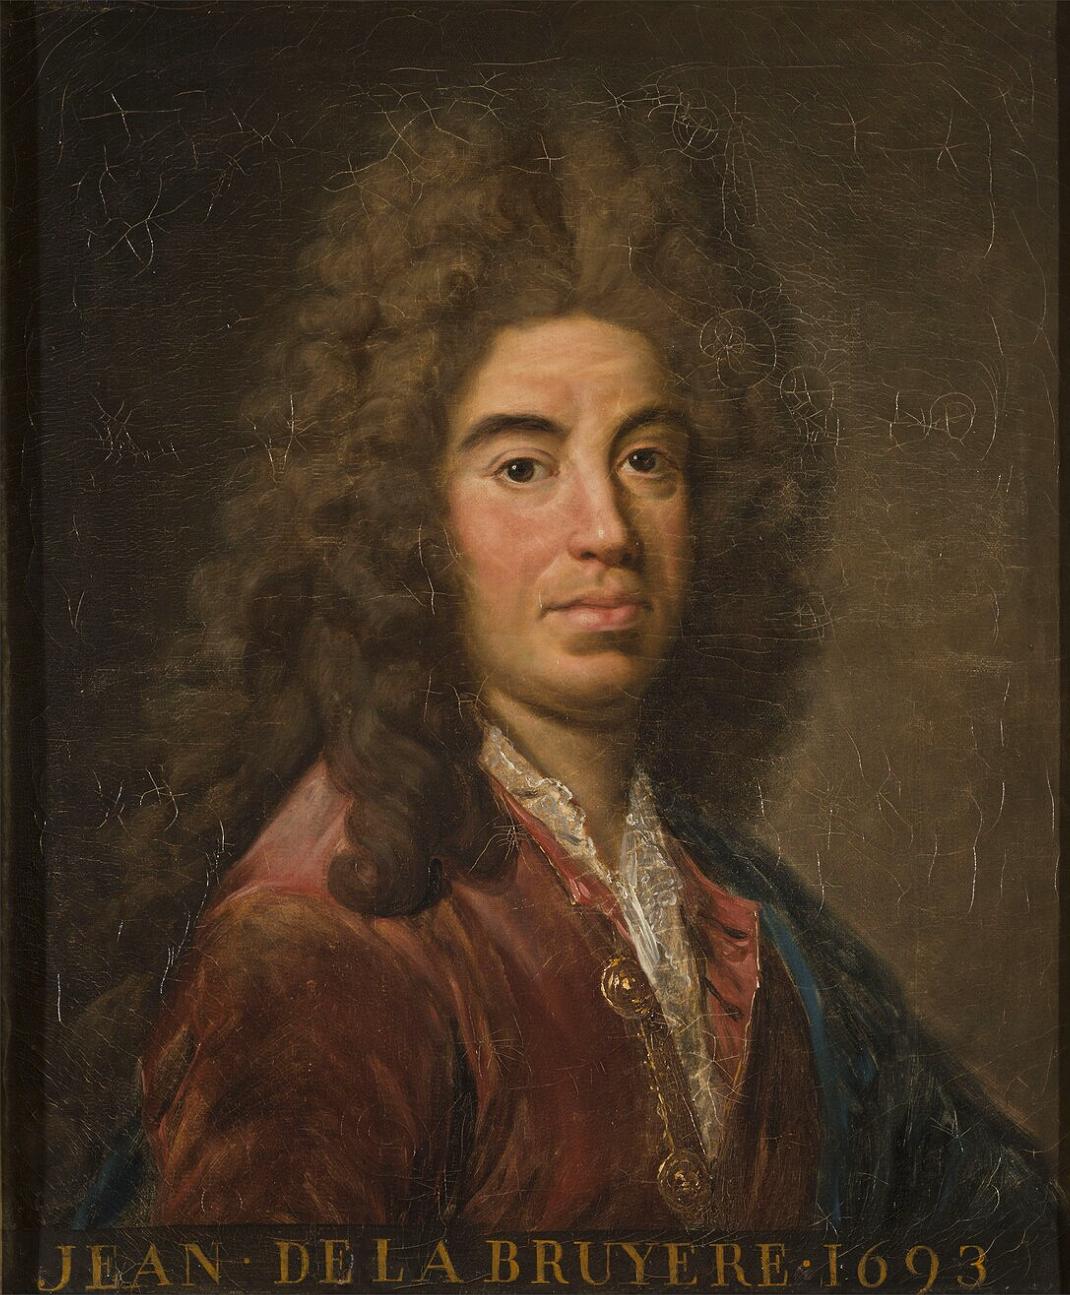 https://upload.wikimedia.org/wikipedia/commons/a/a0/Jean_de_la_Bruy%C3%A8re_-_Versailles_MV_2940.png